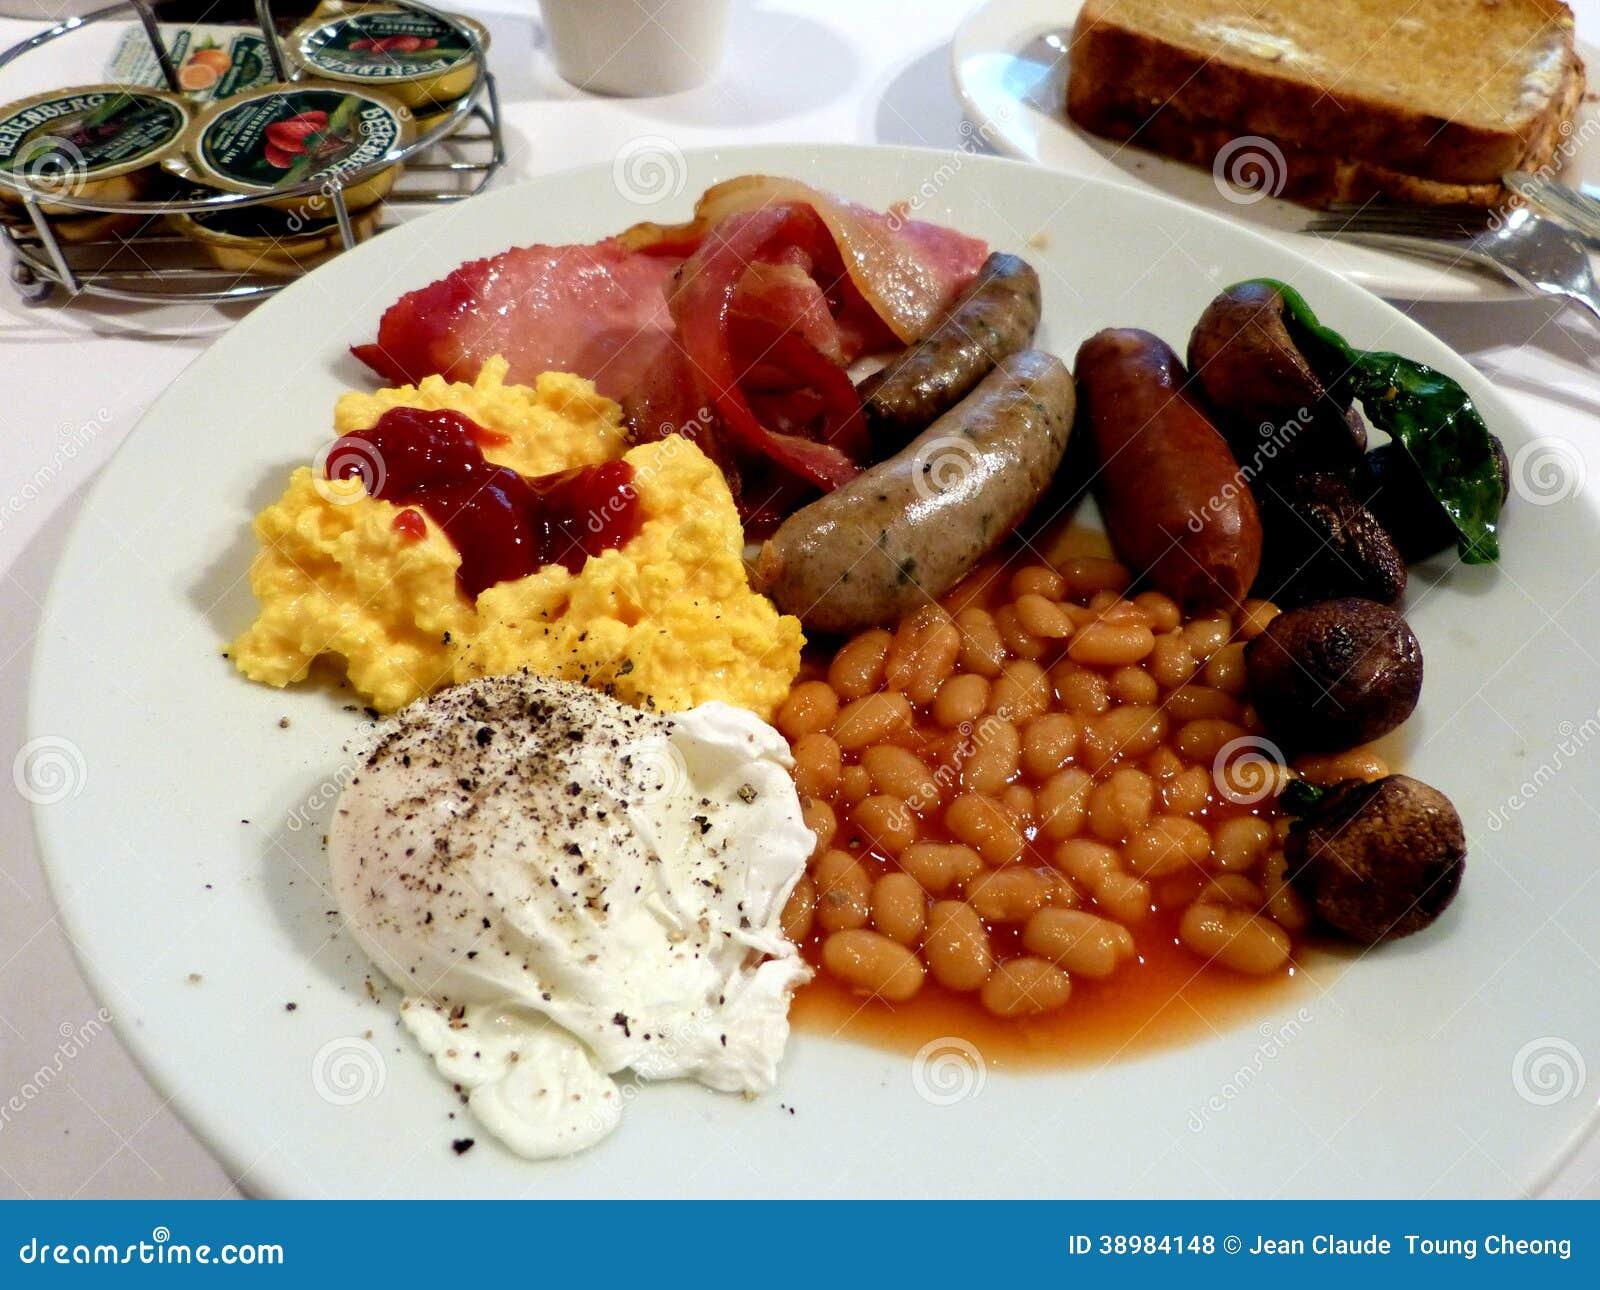 Yummy full english breakfast in australia stock photo for Authentic australian cuisine